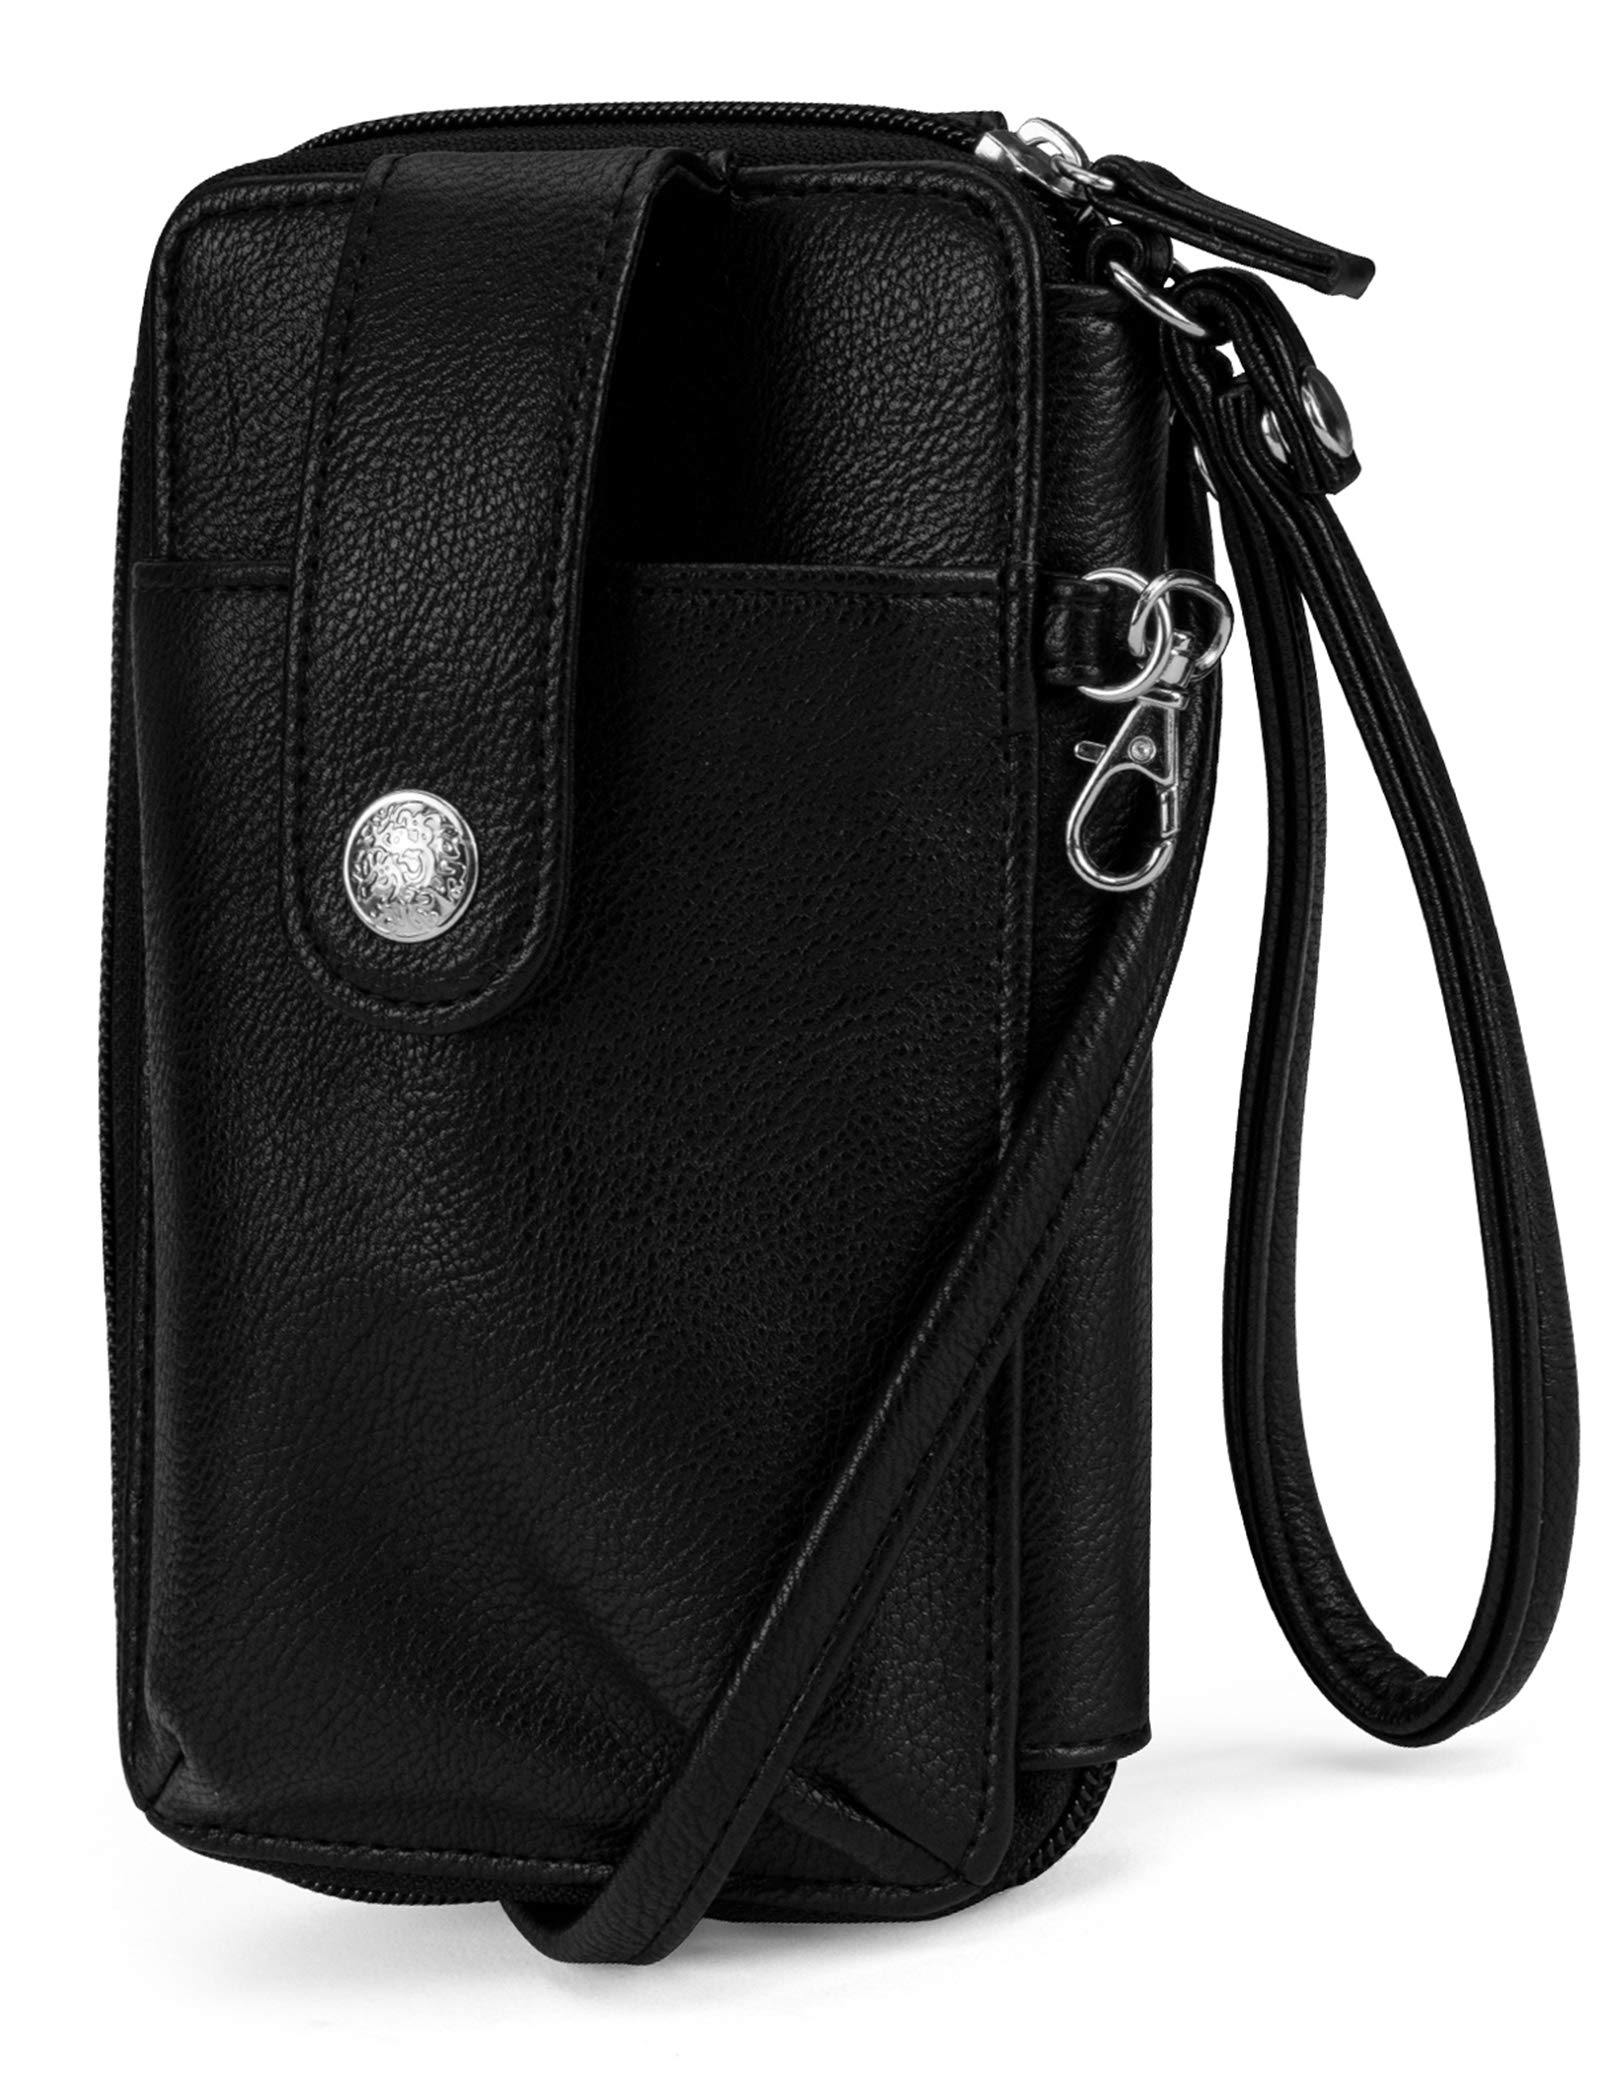 MUNDI Jacqui Vegan Leather RFID Womens Crossbody Cell Phone Purse Holder Wallet (Black Night) by Mundi